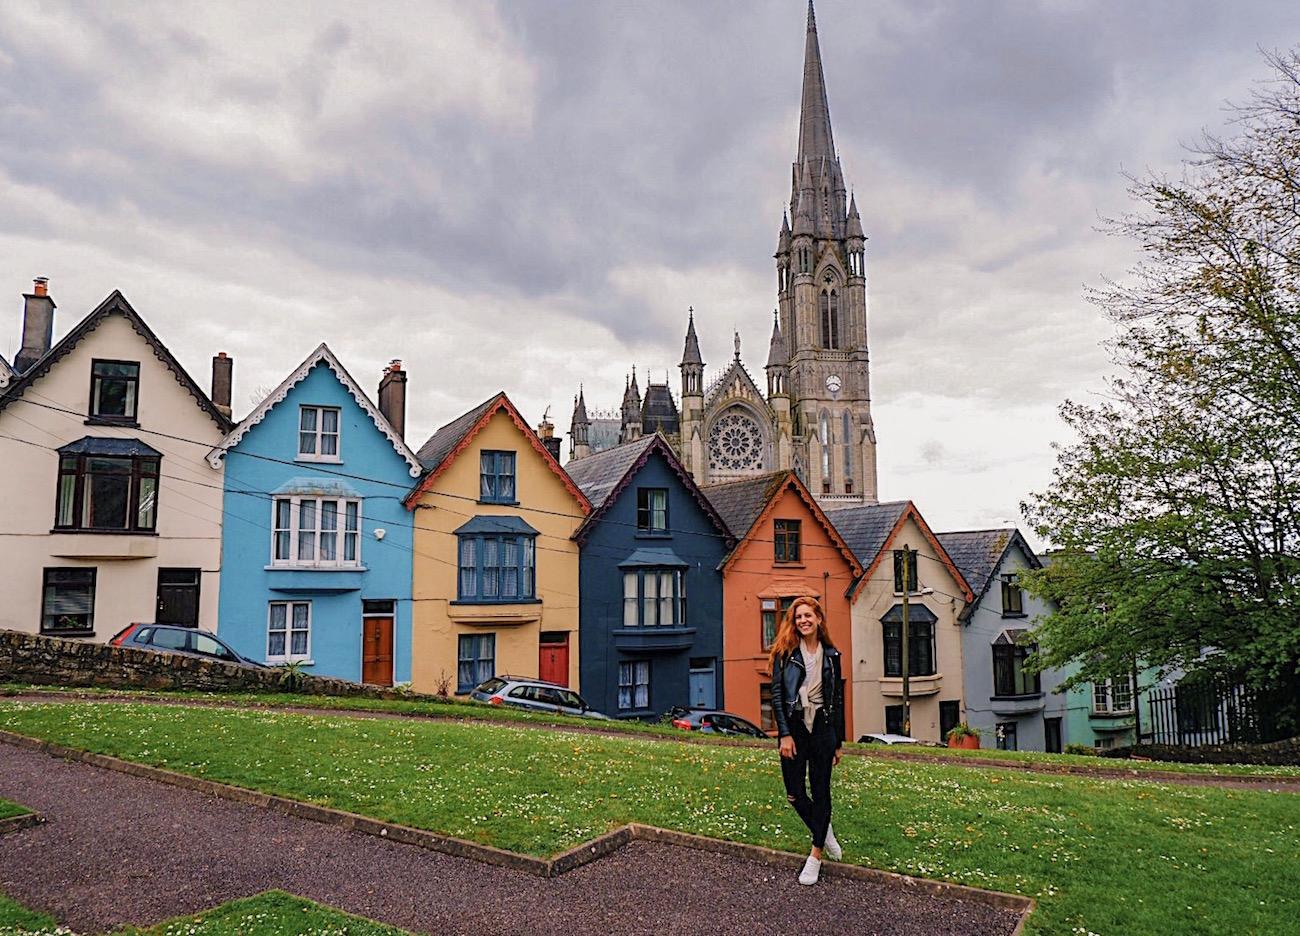 redhead-round-the-world-blogger-ireland-destinations-cobh-colours.JPG